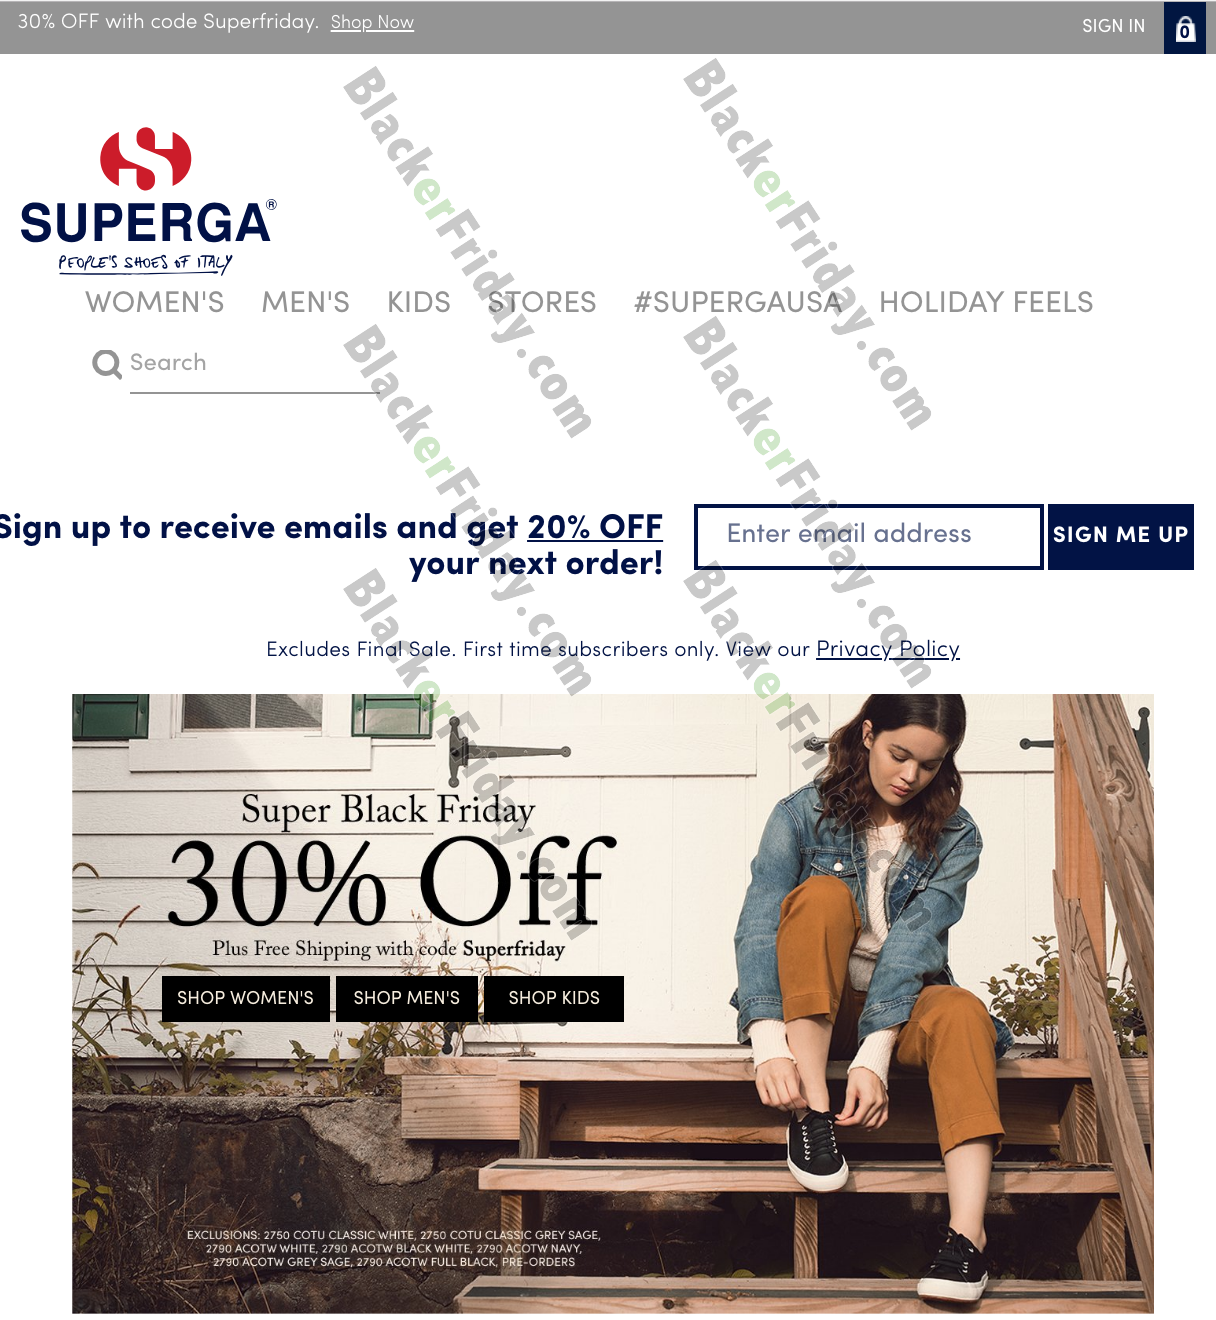 Superga Black Friday 2020 Sale - What